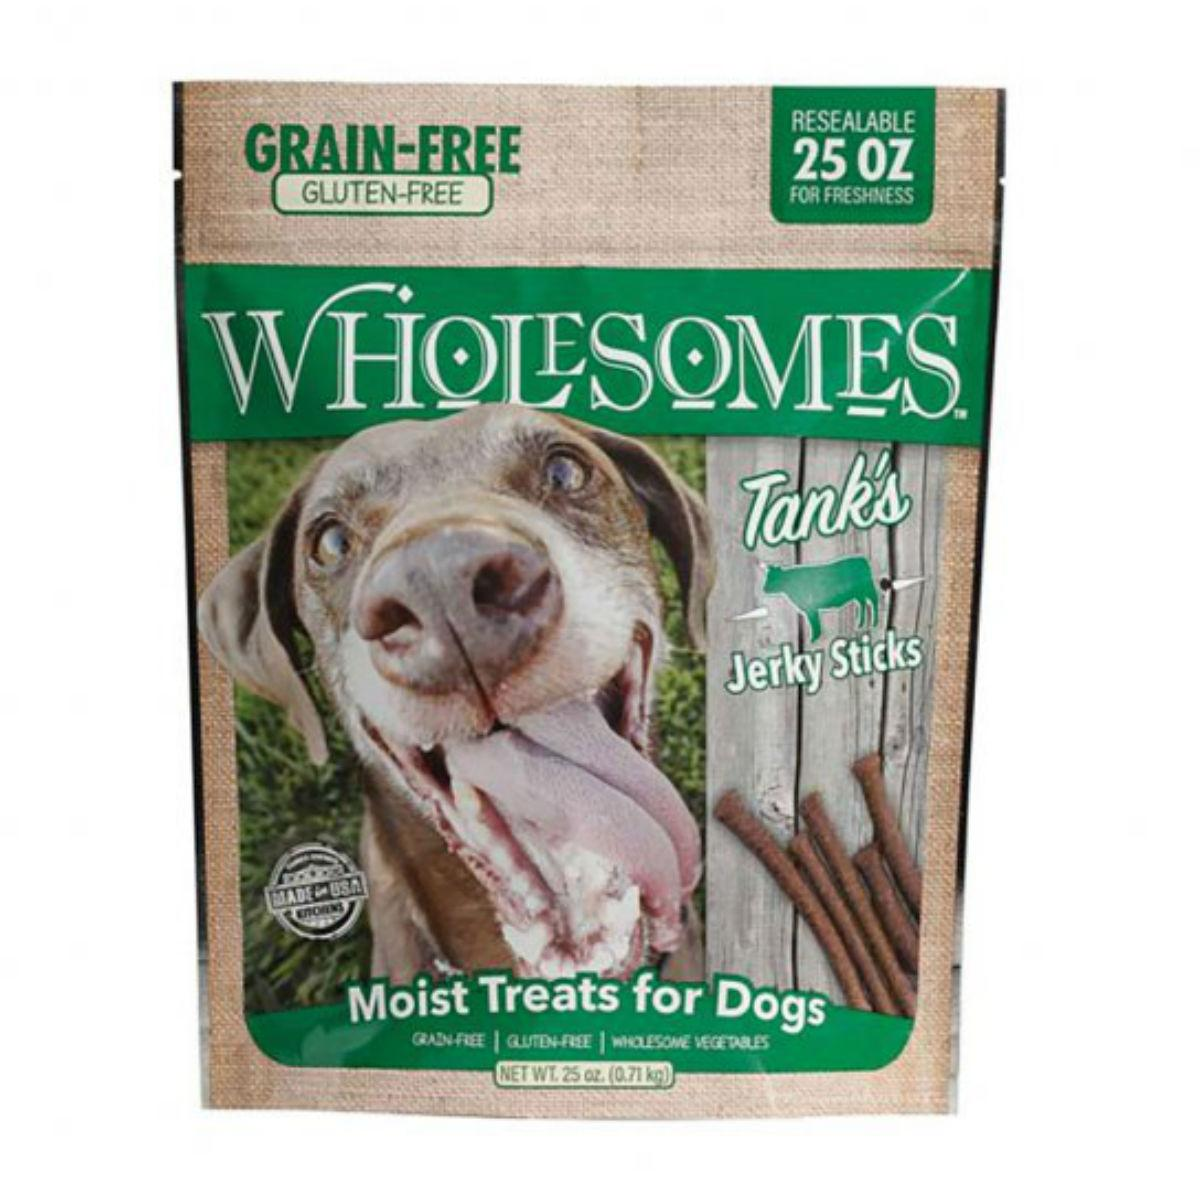 Sportmix Wholesomes Tank's Beef Jerky Sticks Dog Treats